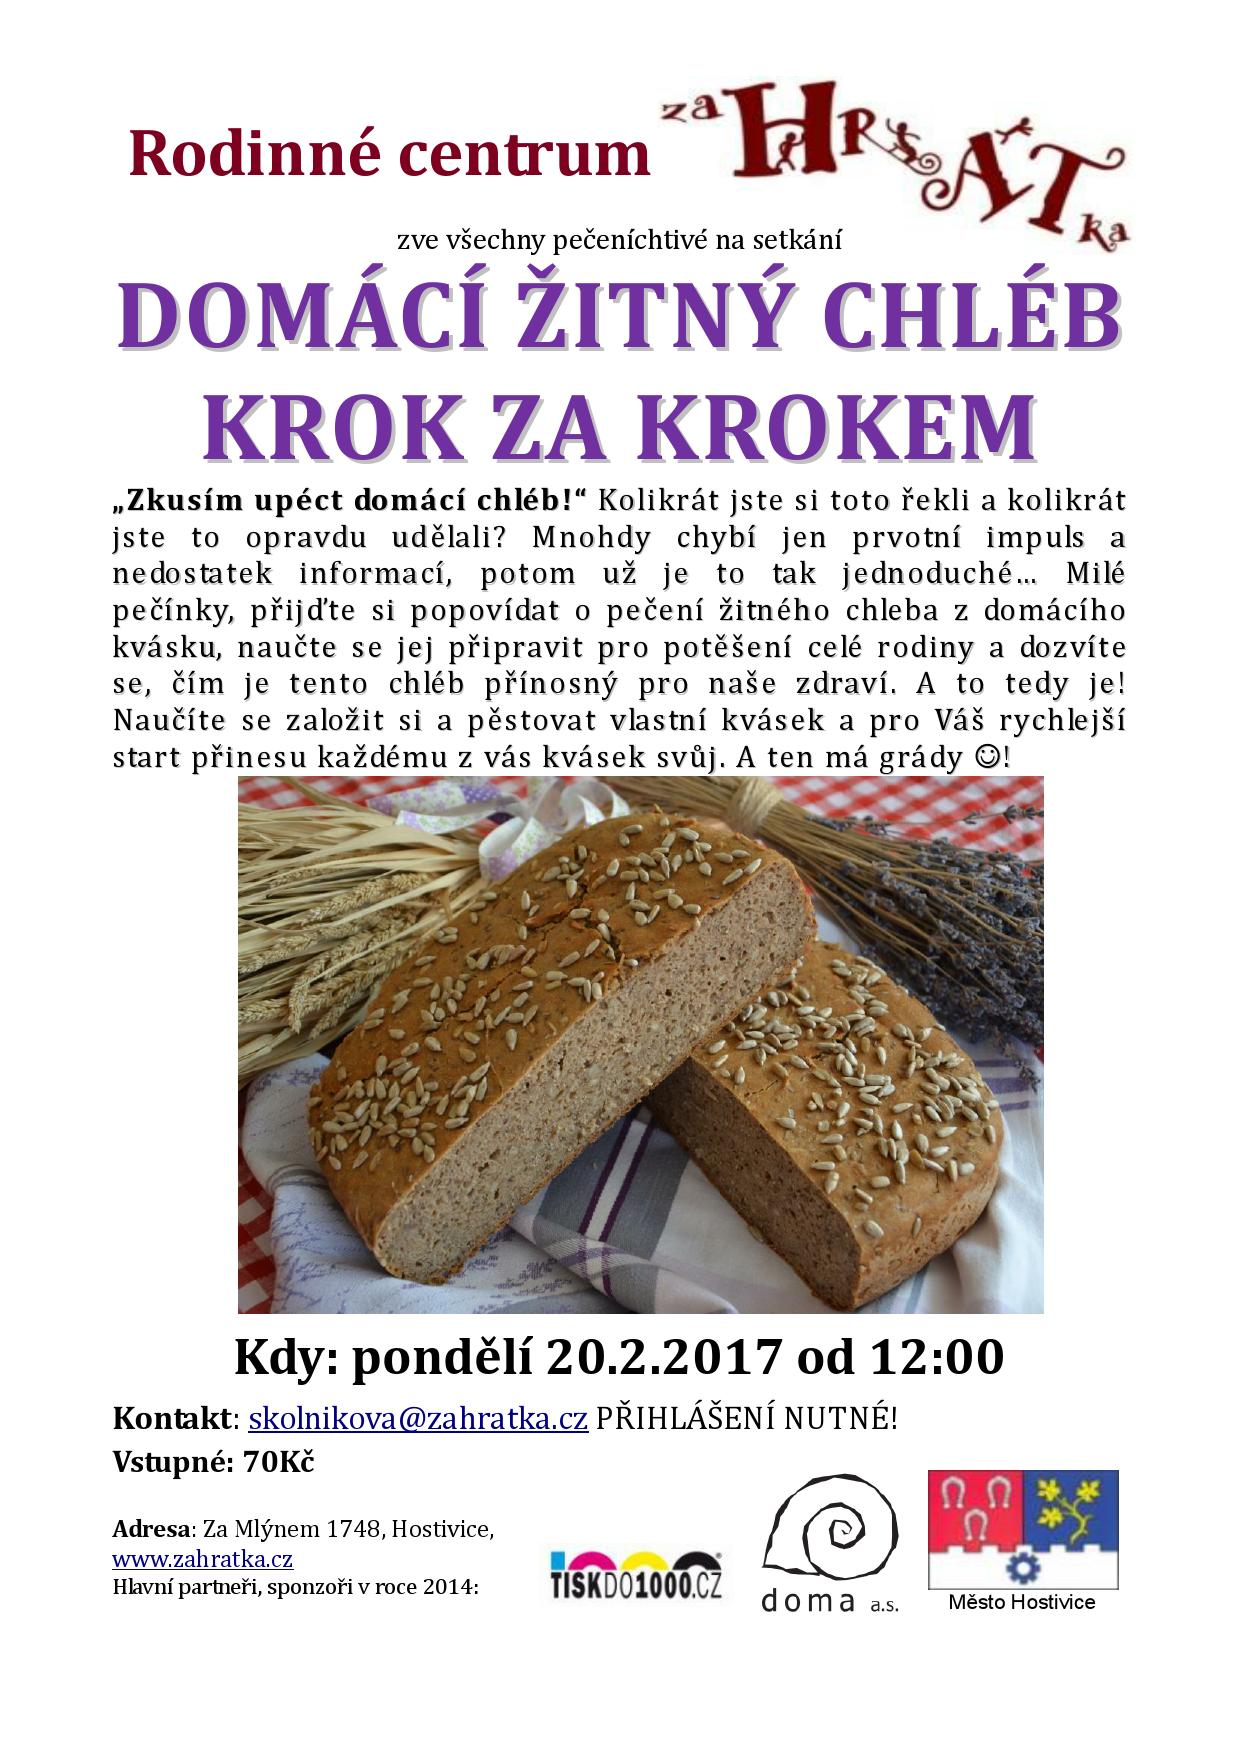 chléb rozkroj 2-2017.pdf-000001